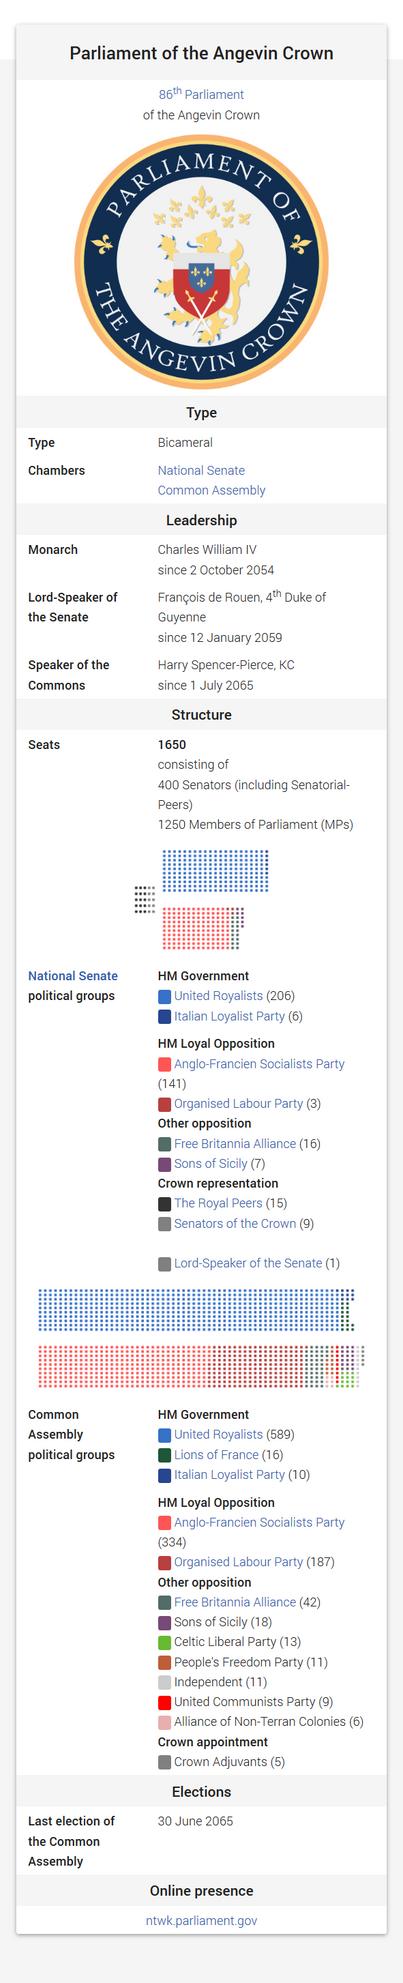 Angevin Parliament (AH Wikibox) by Maonsie